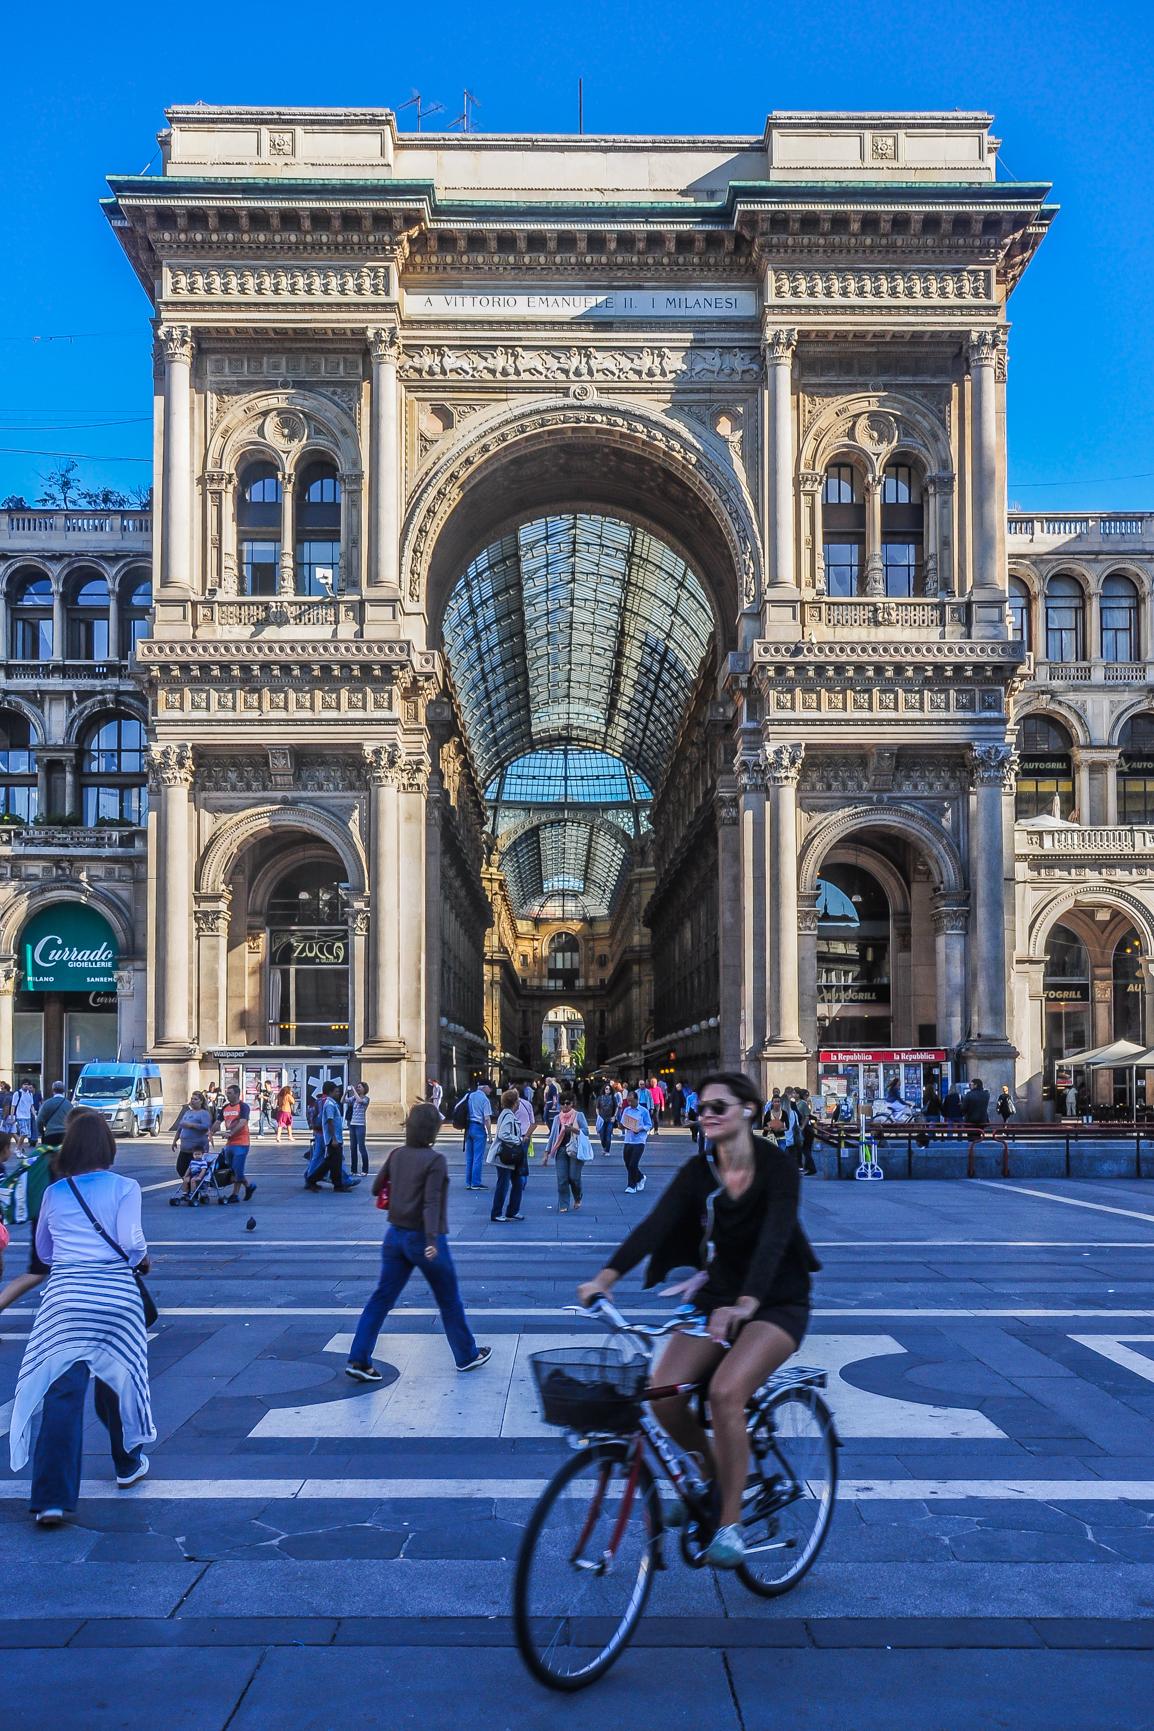 G. V. Emanuele II Milano / Italy